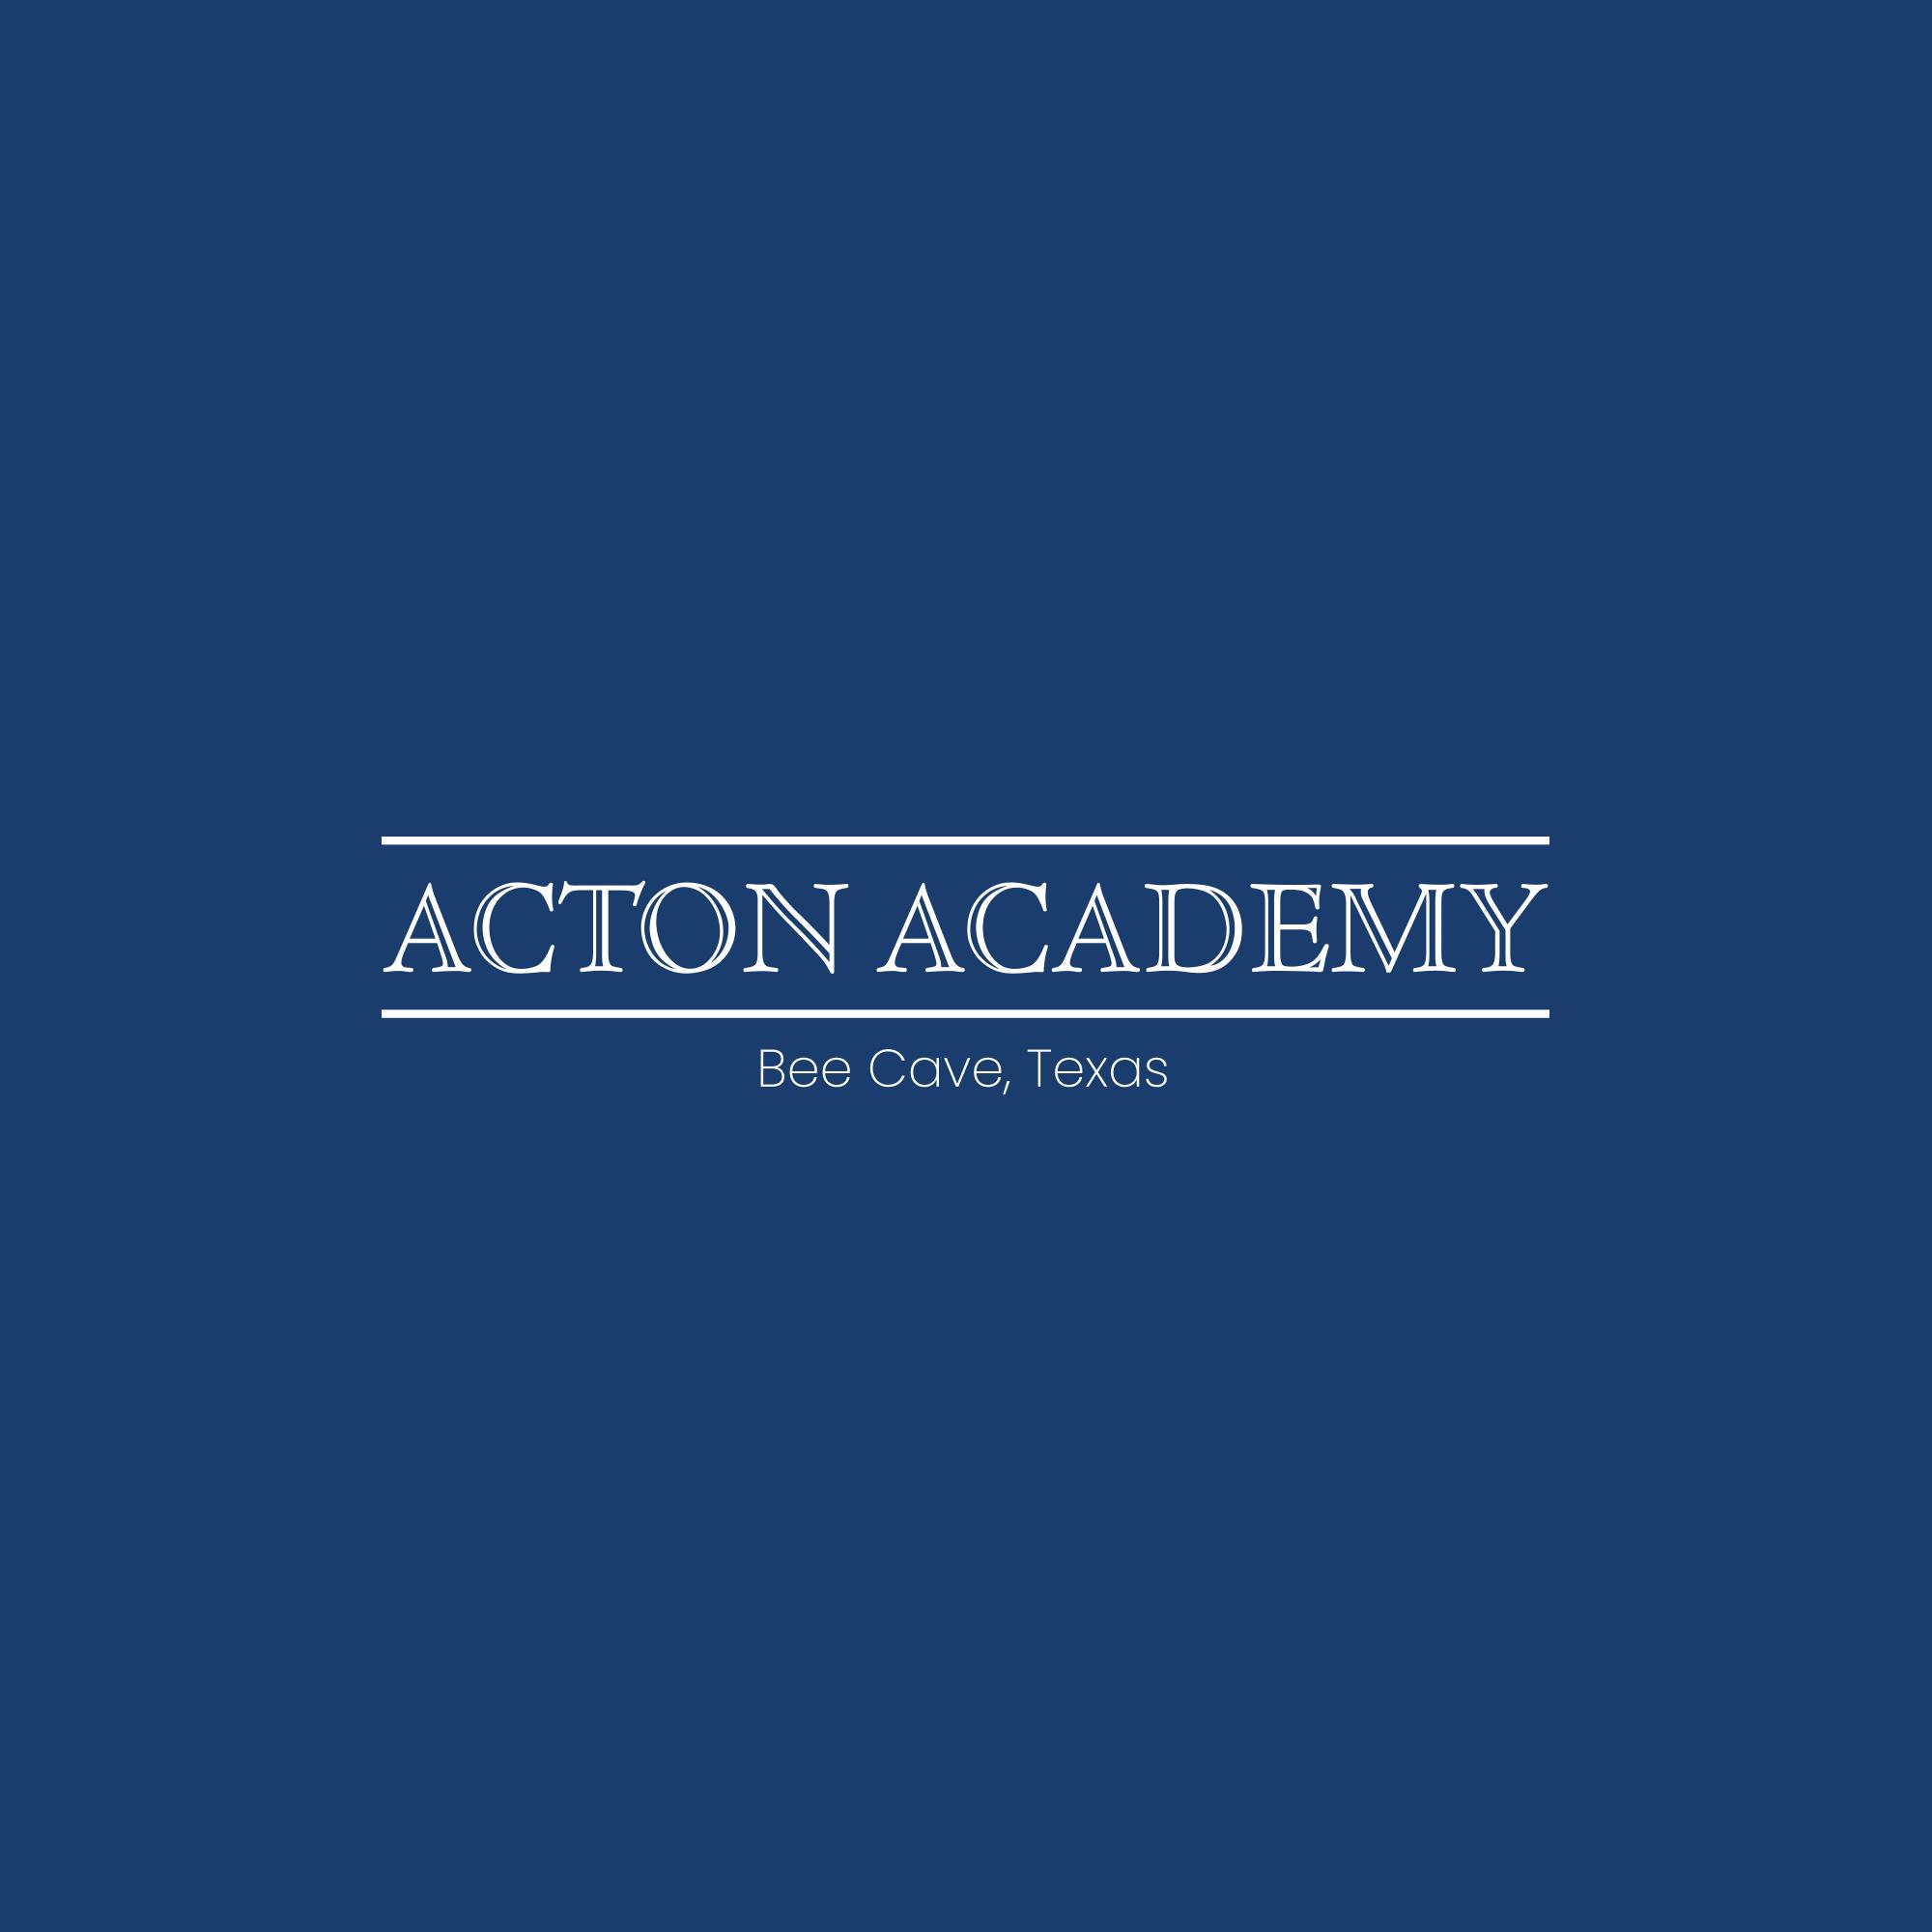 Acton Academy Bee Cave, Texas